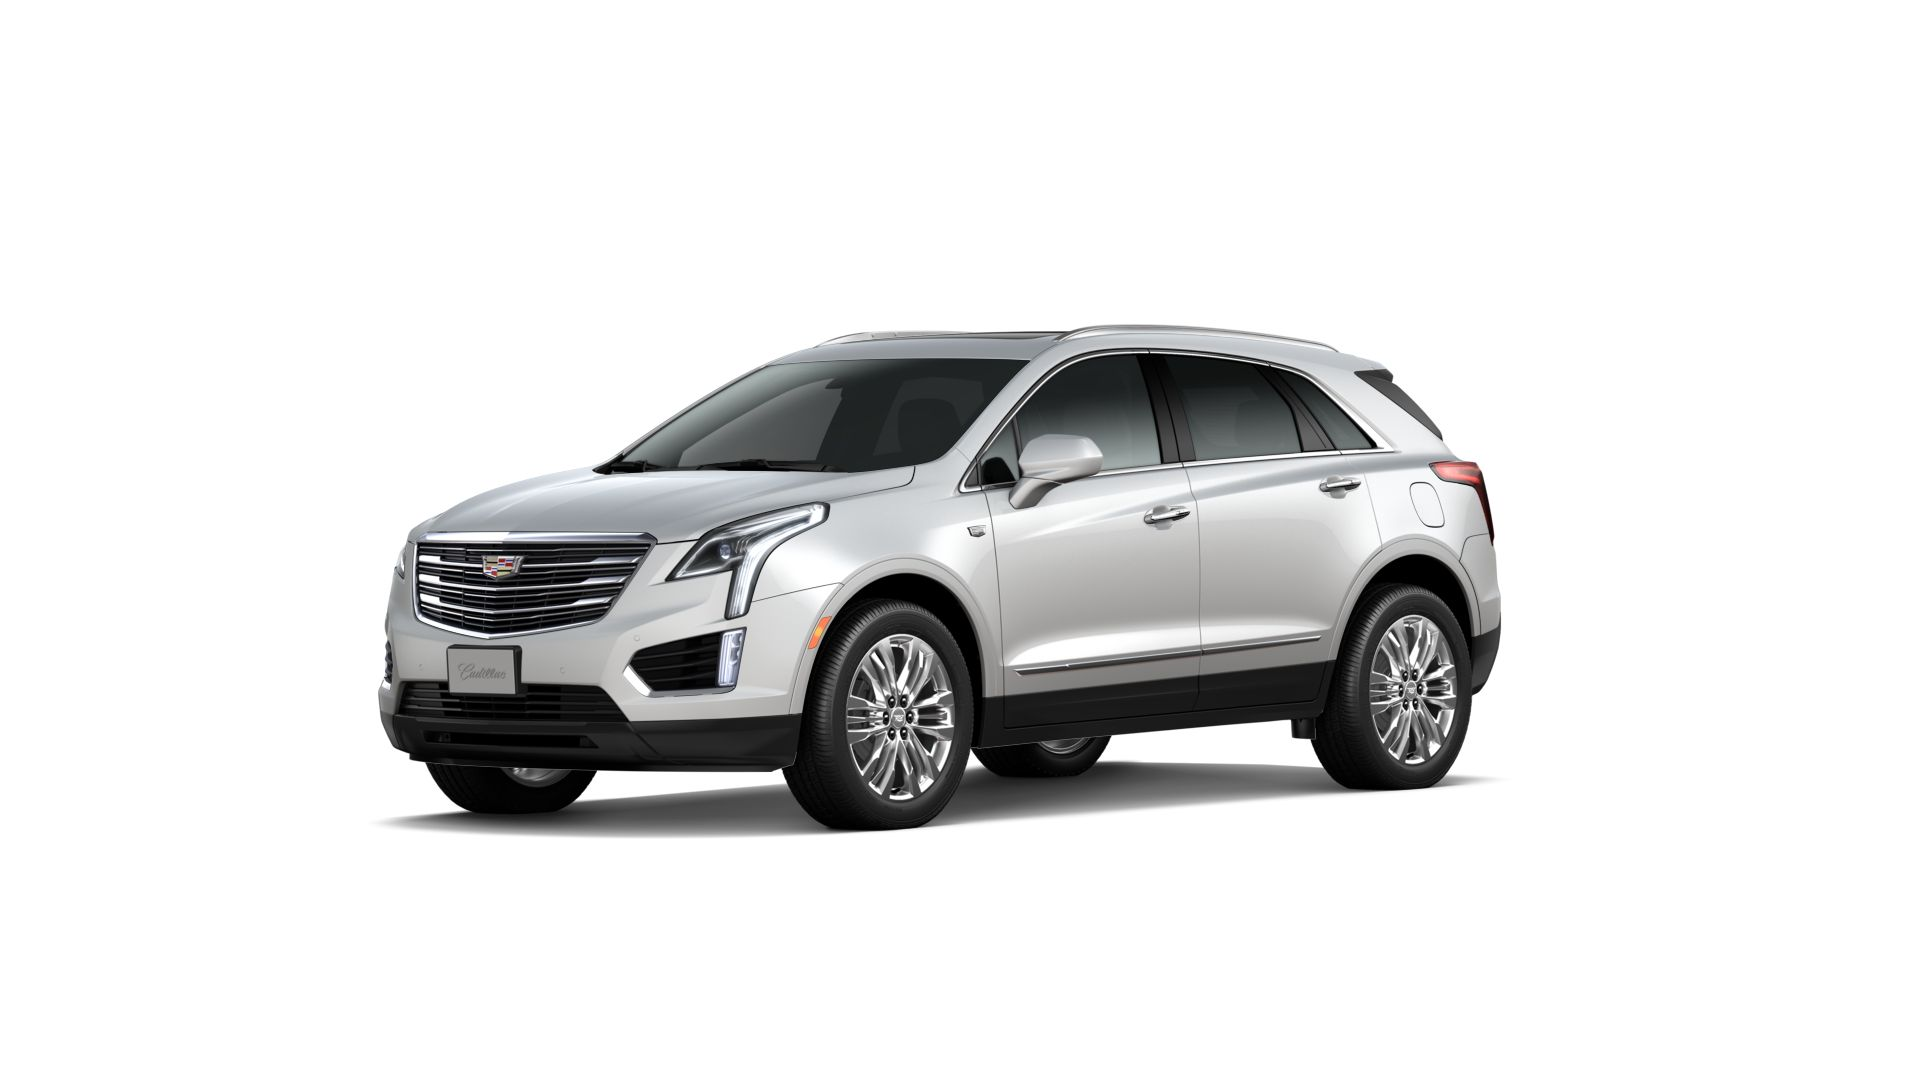 2019 Cadillac XT5 3.6L Premium Luxury FWD